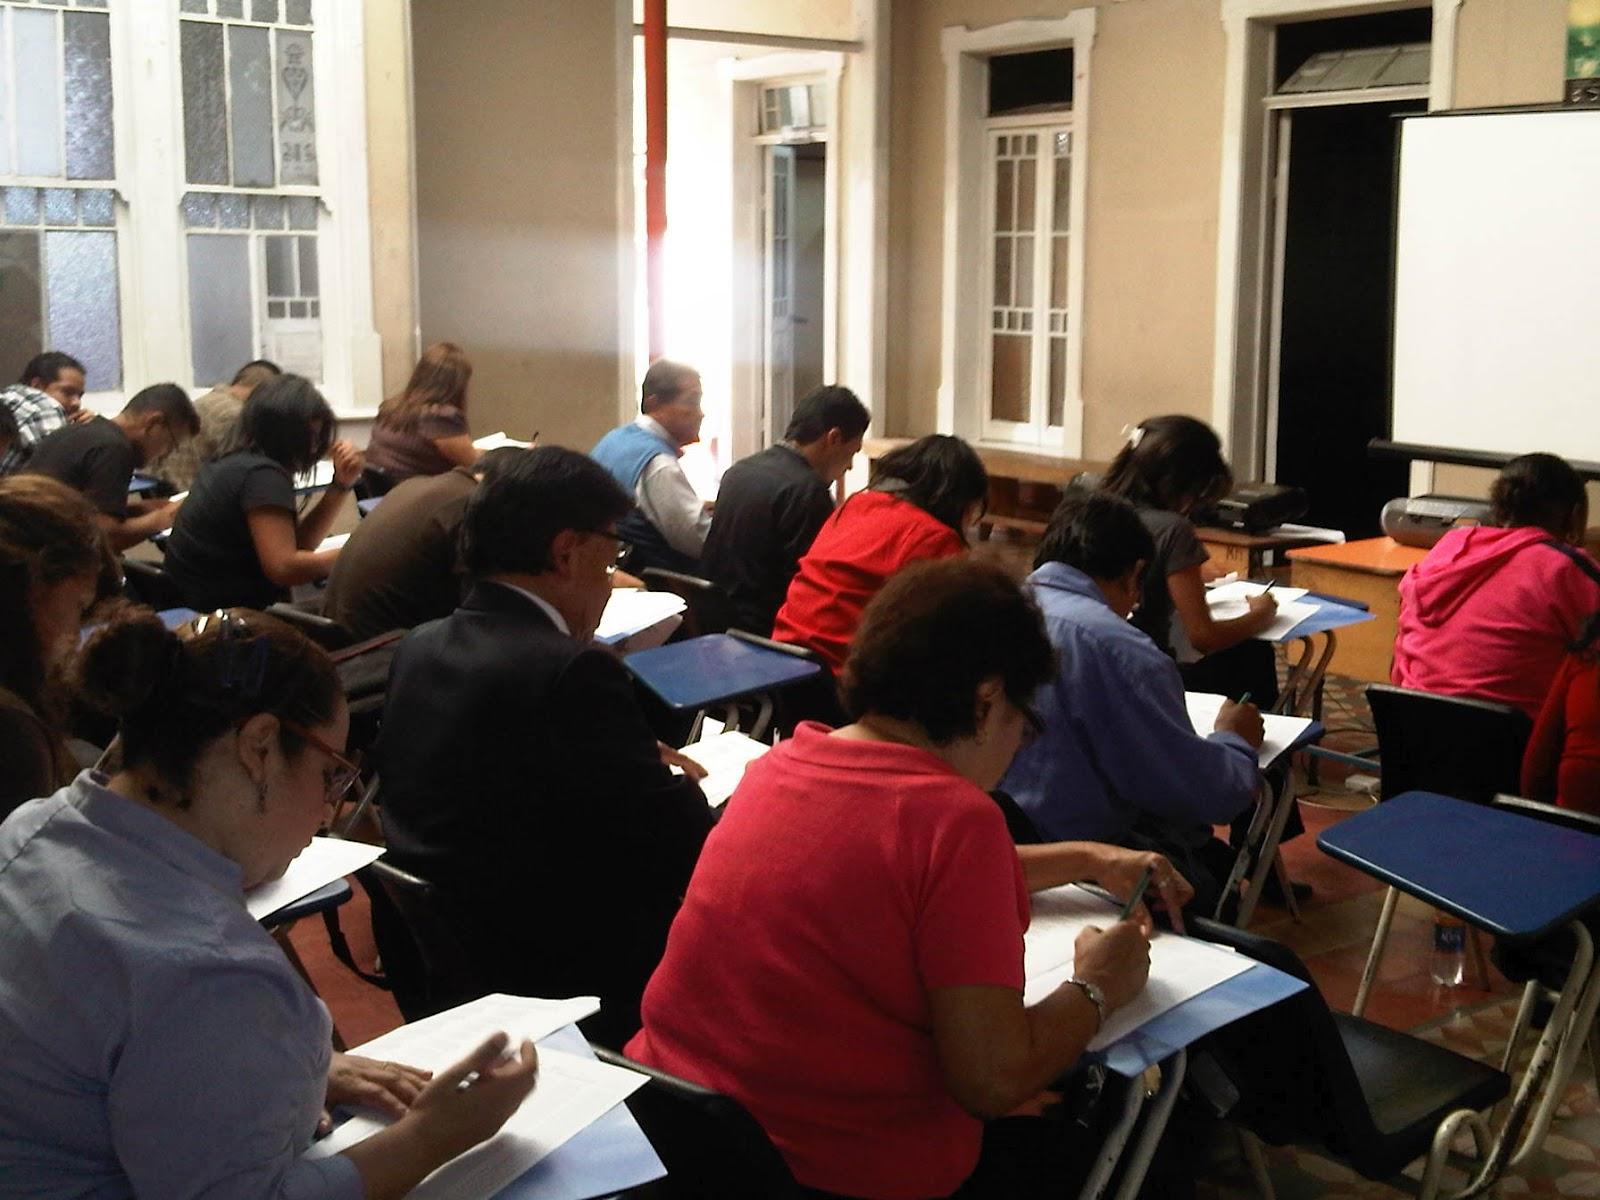 Ciav internal newsletter convocatoria de maestros for Convocatoria de maestros